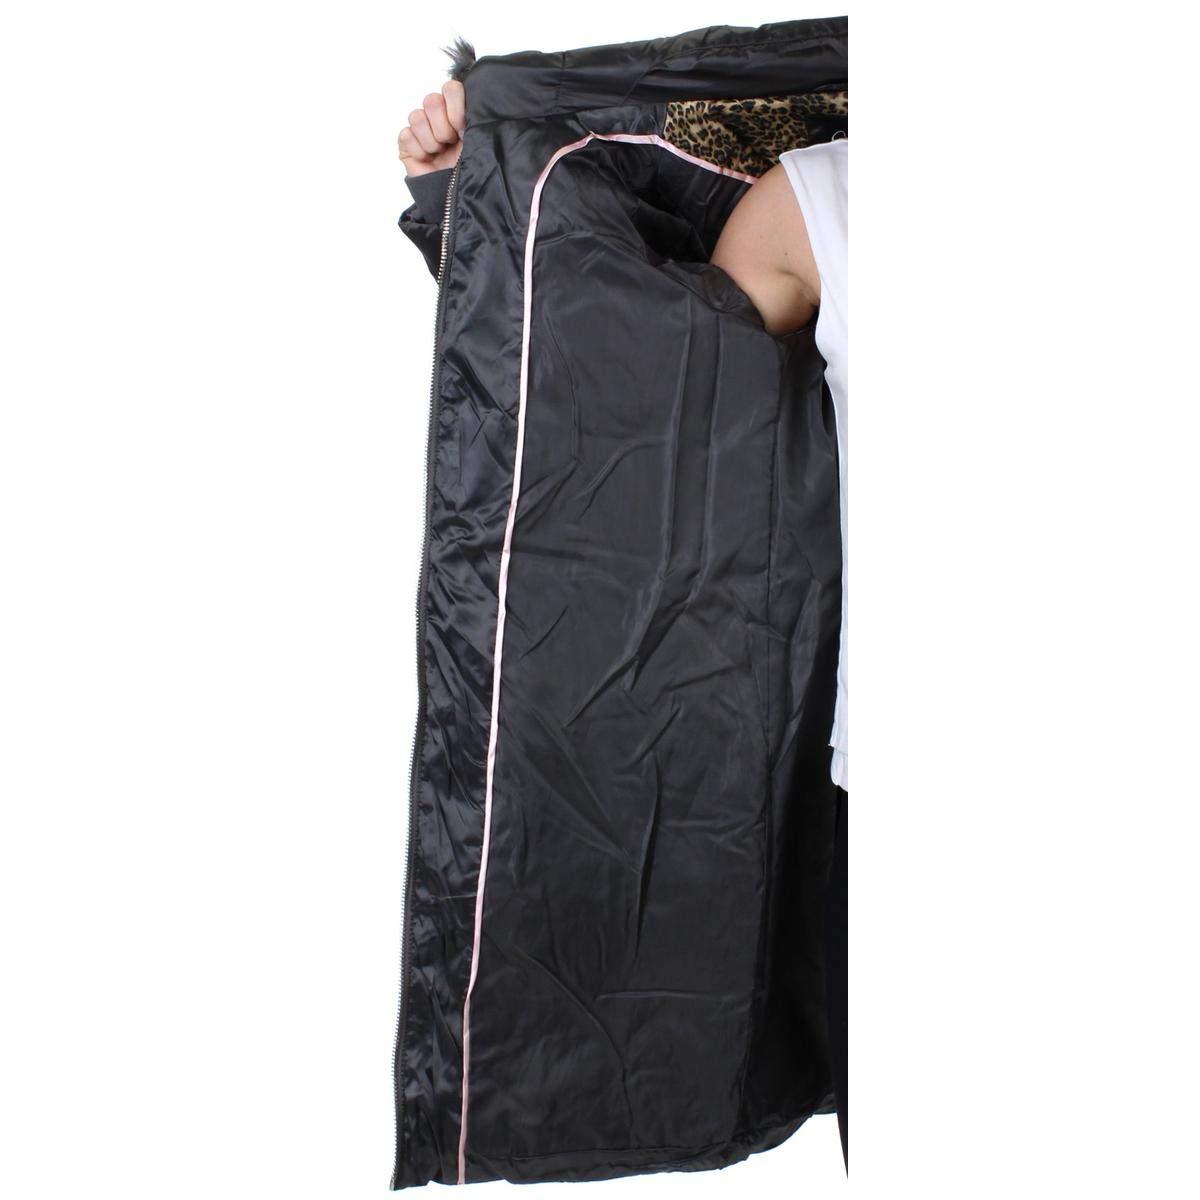 Jessica Simpson Womens Fashion Puffer Jacket